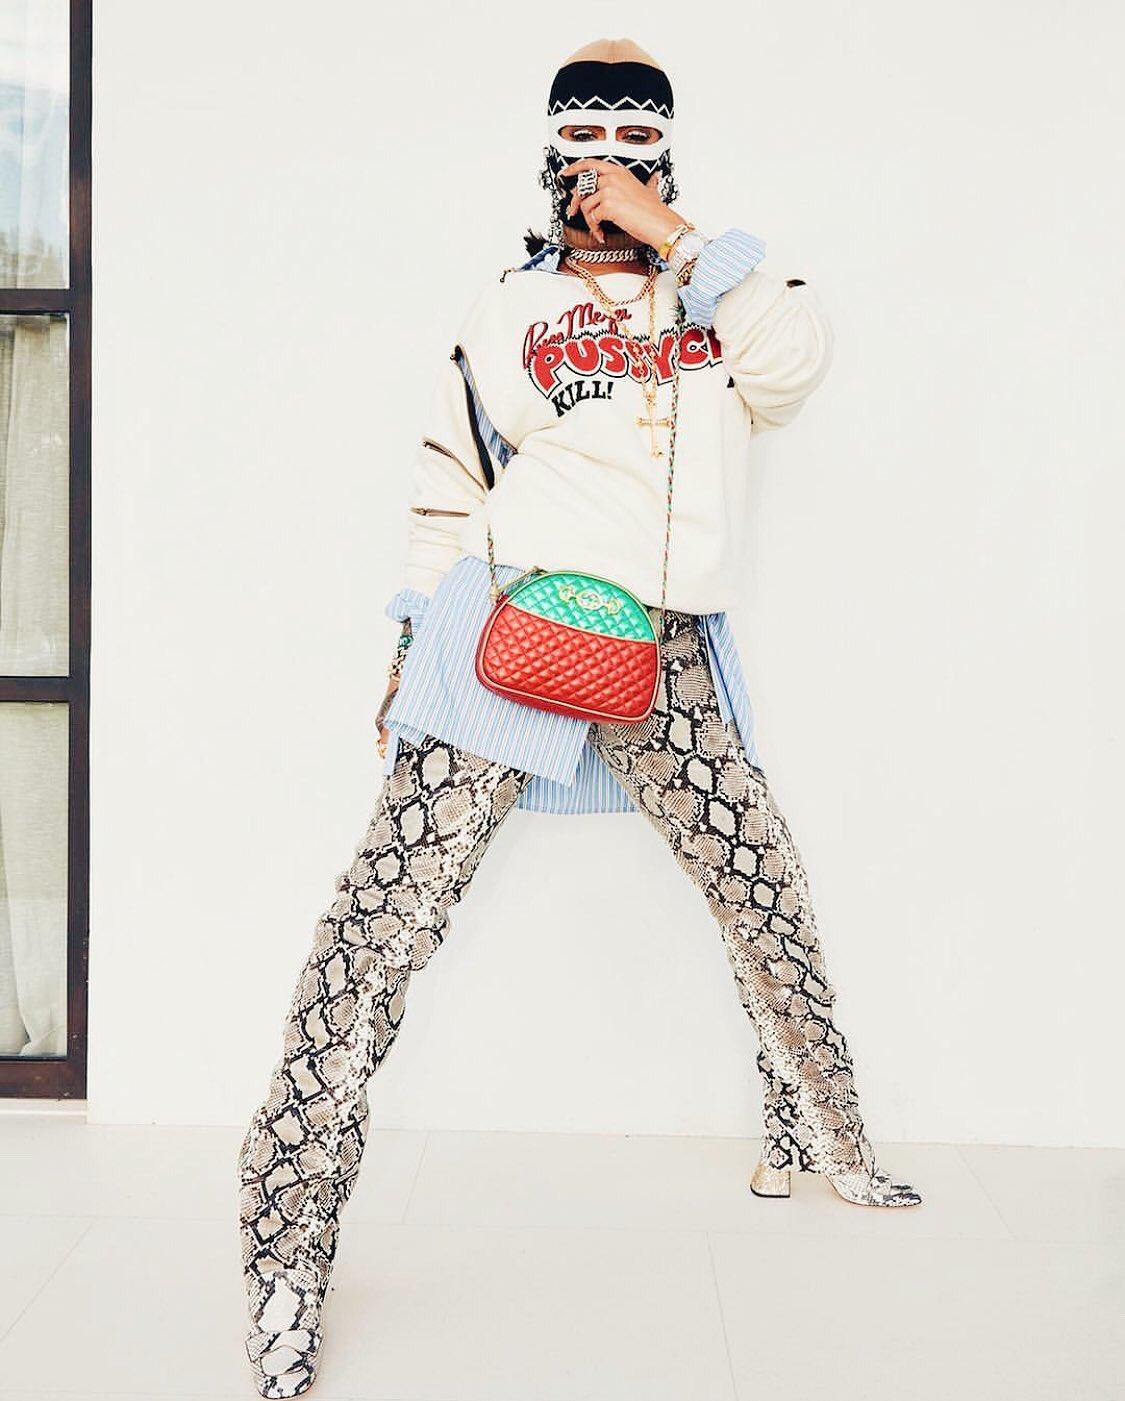 .@Rihanna in Gucci ladies & gentlemen. #Coachella https://t.co/Yyb3nMfgfg